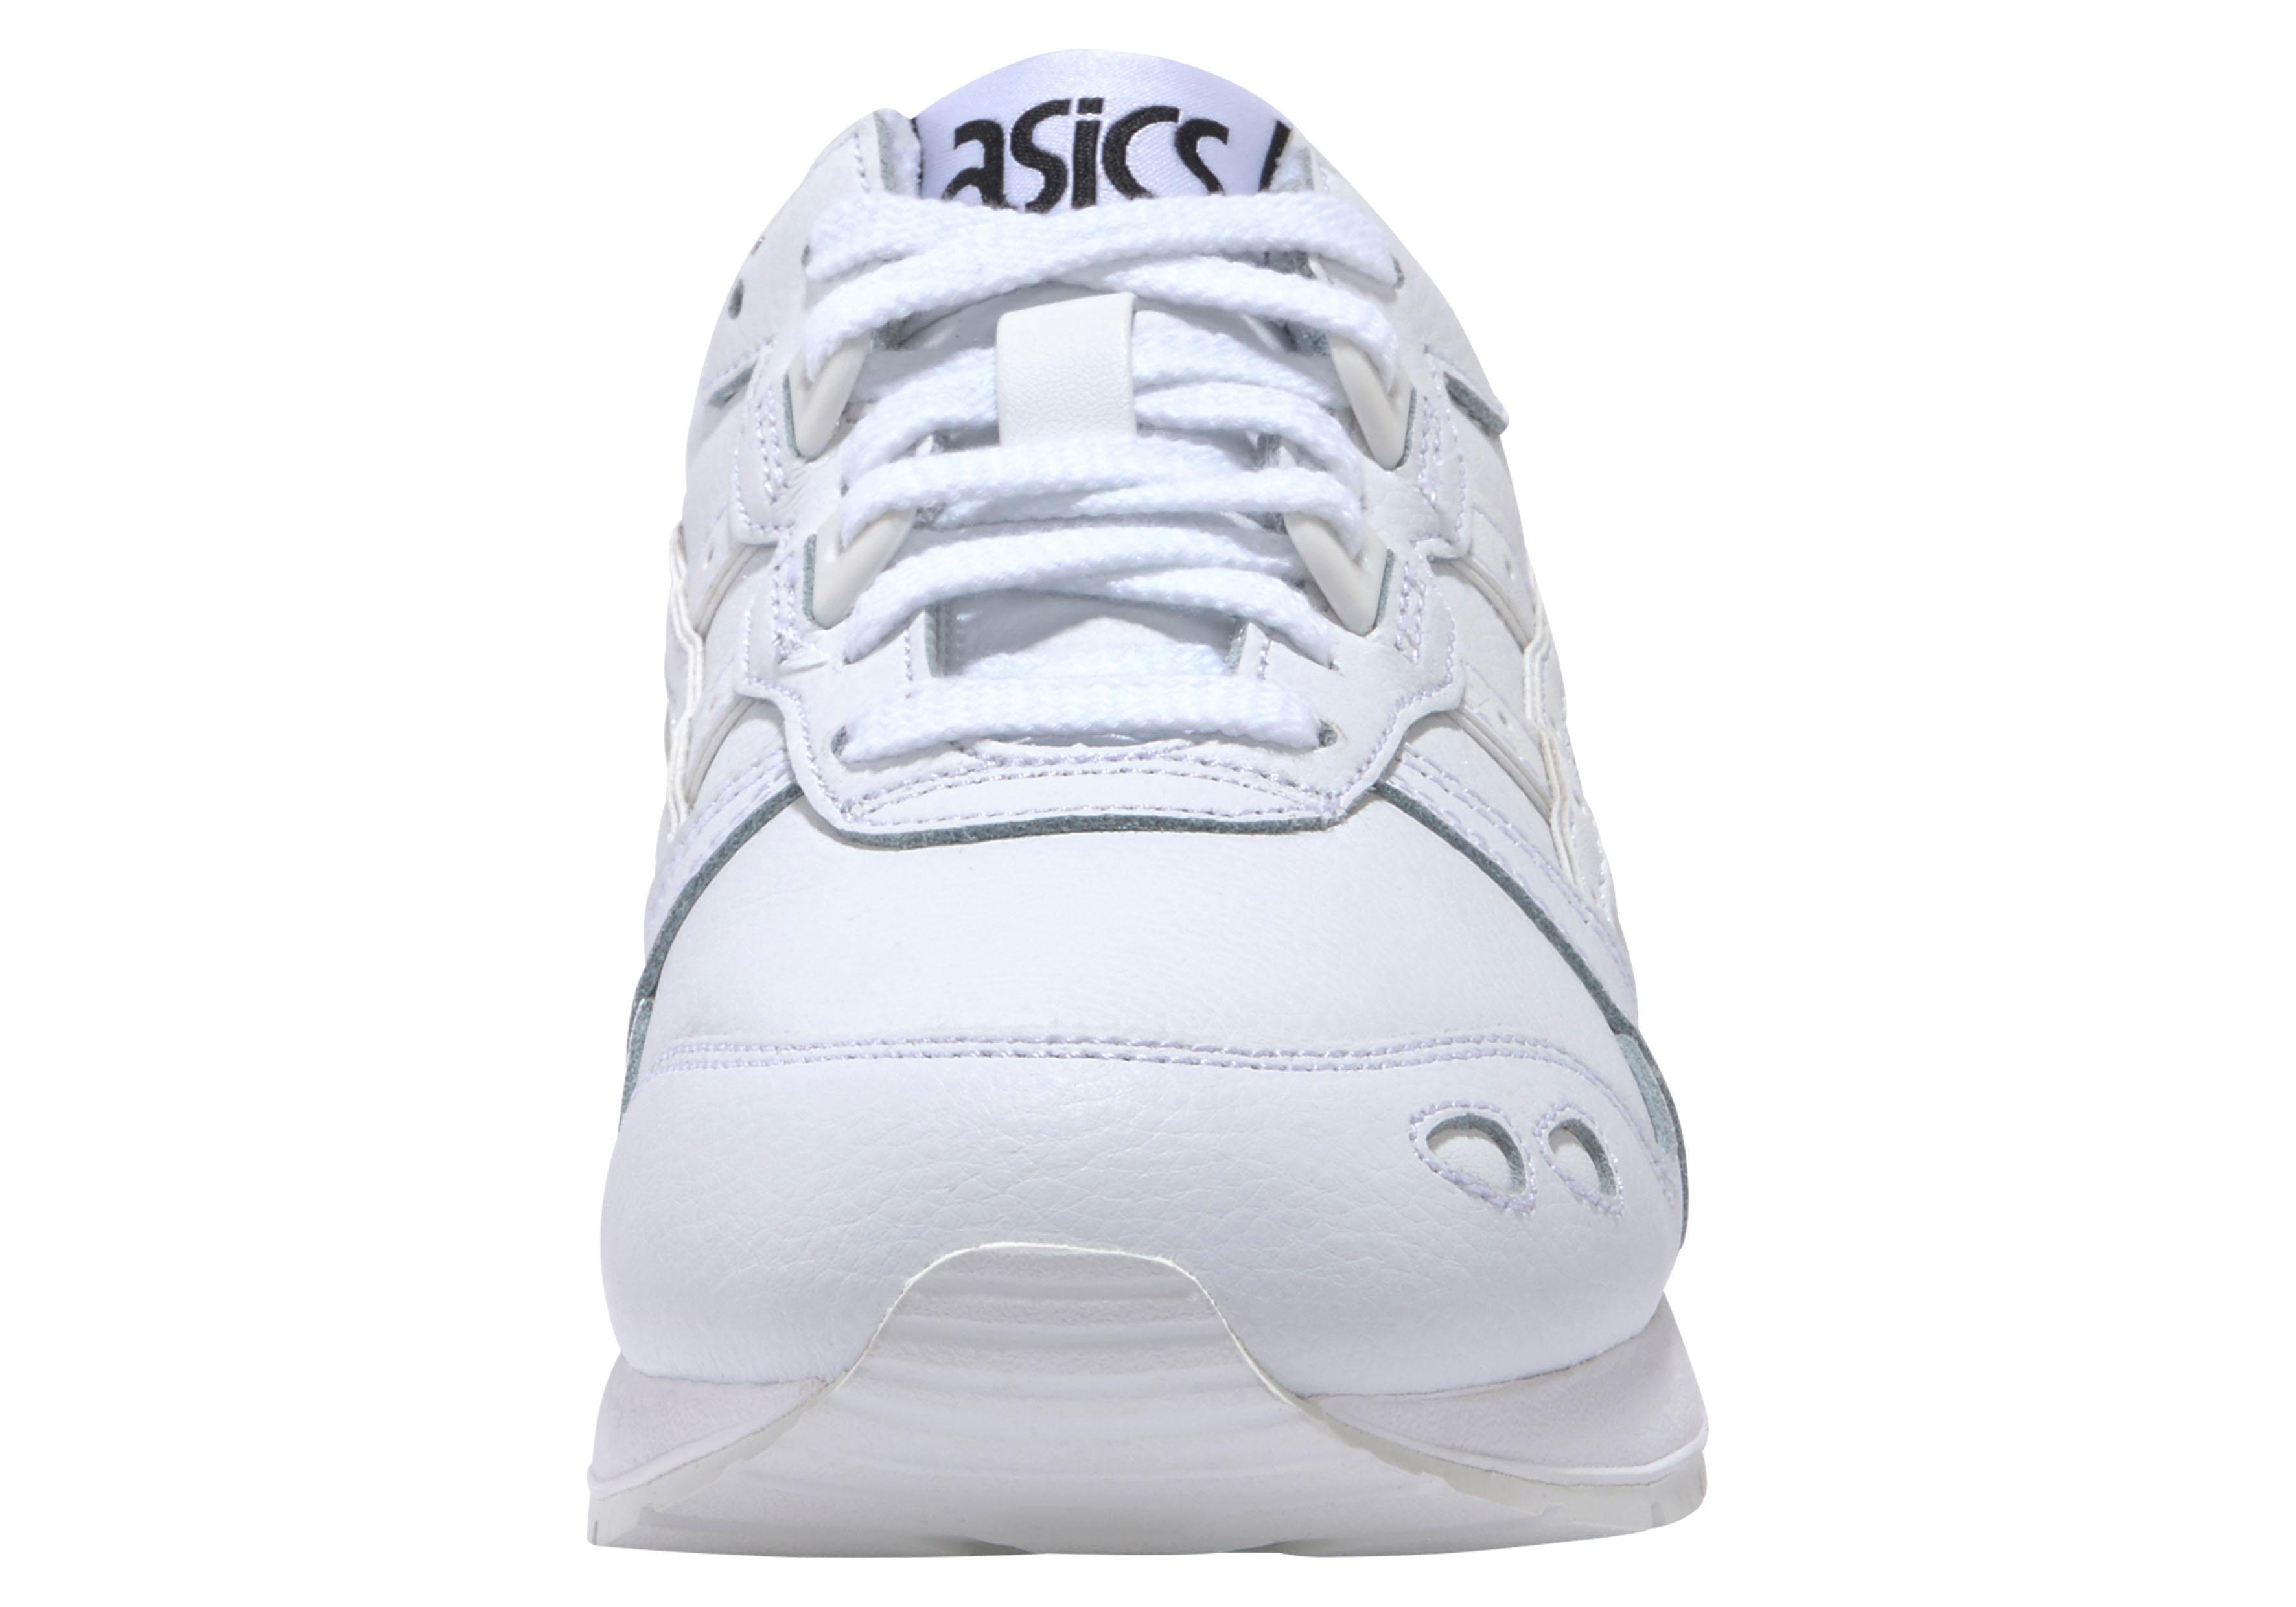 Snel Tiger Sneakersgel Gevonden Asics lyte 0kNnOwZ8PX